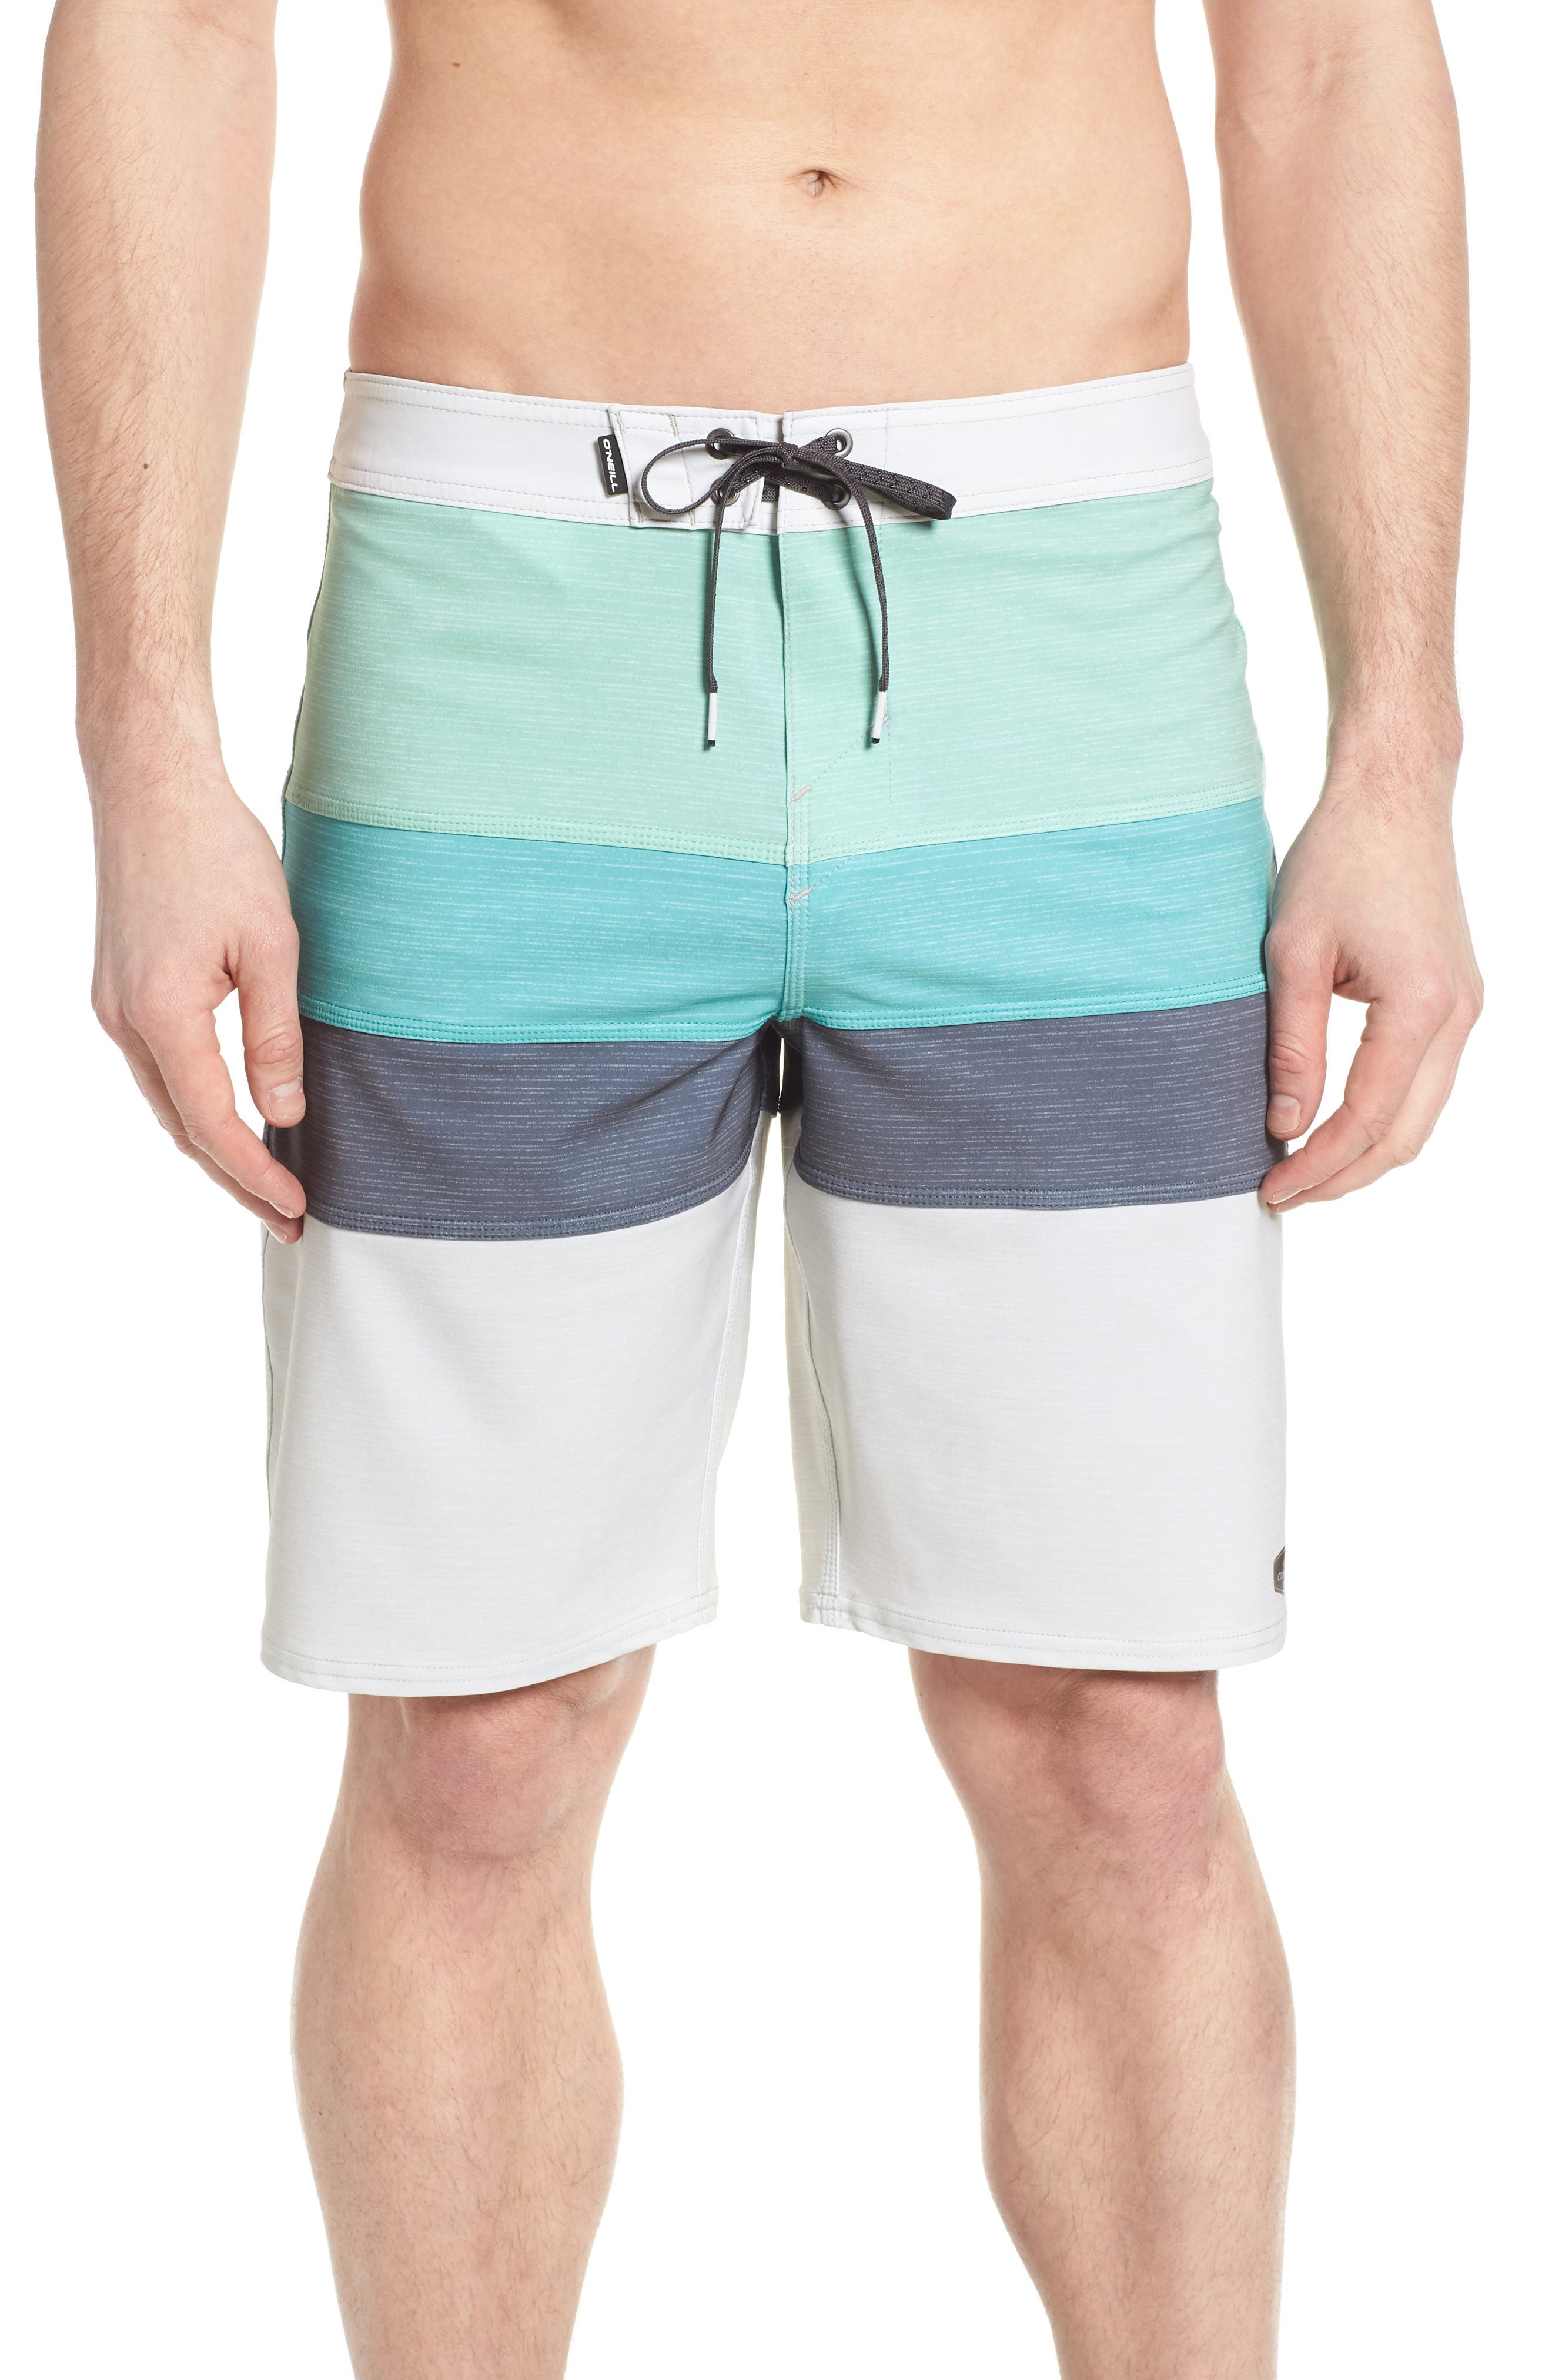 O'Neill Hyperfreak Quatro Board Shorts